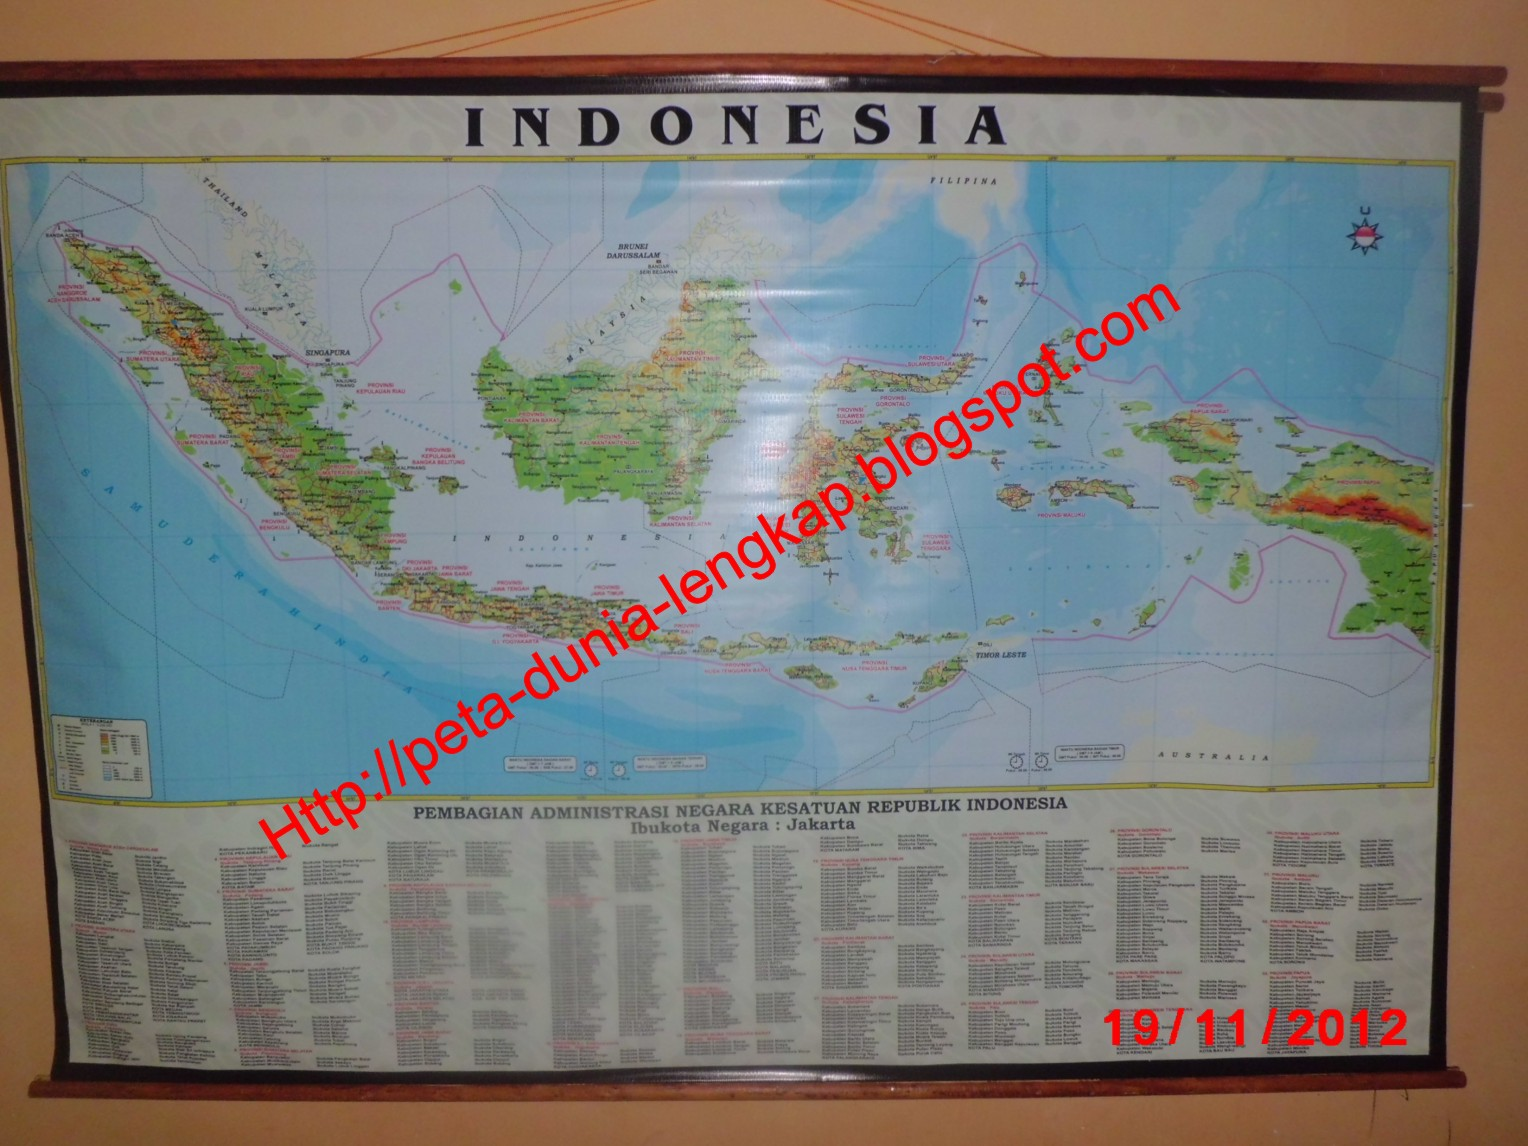 Peta+Indonesia+Lengkap.jpg